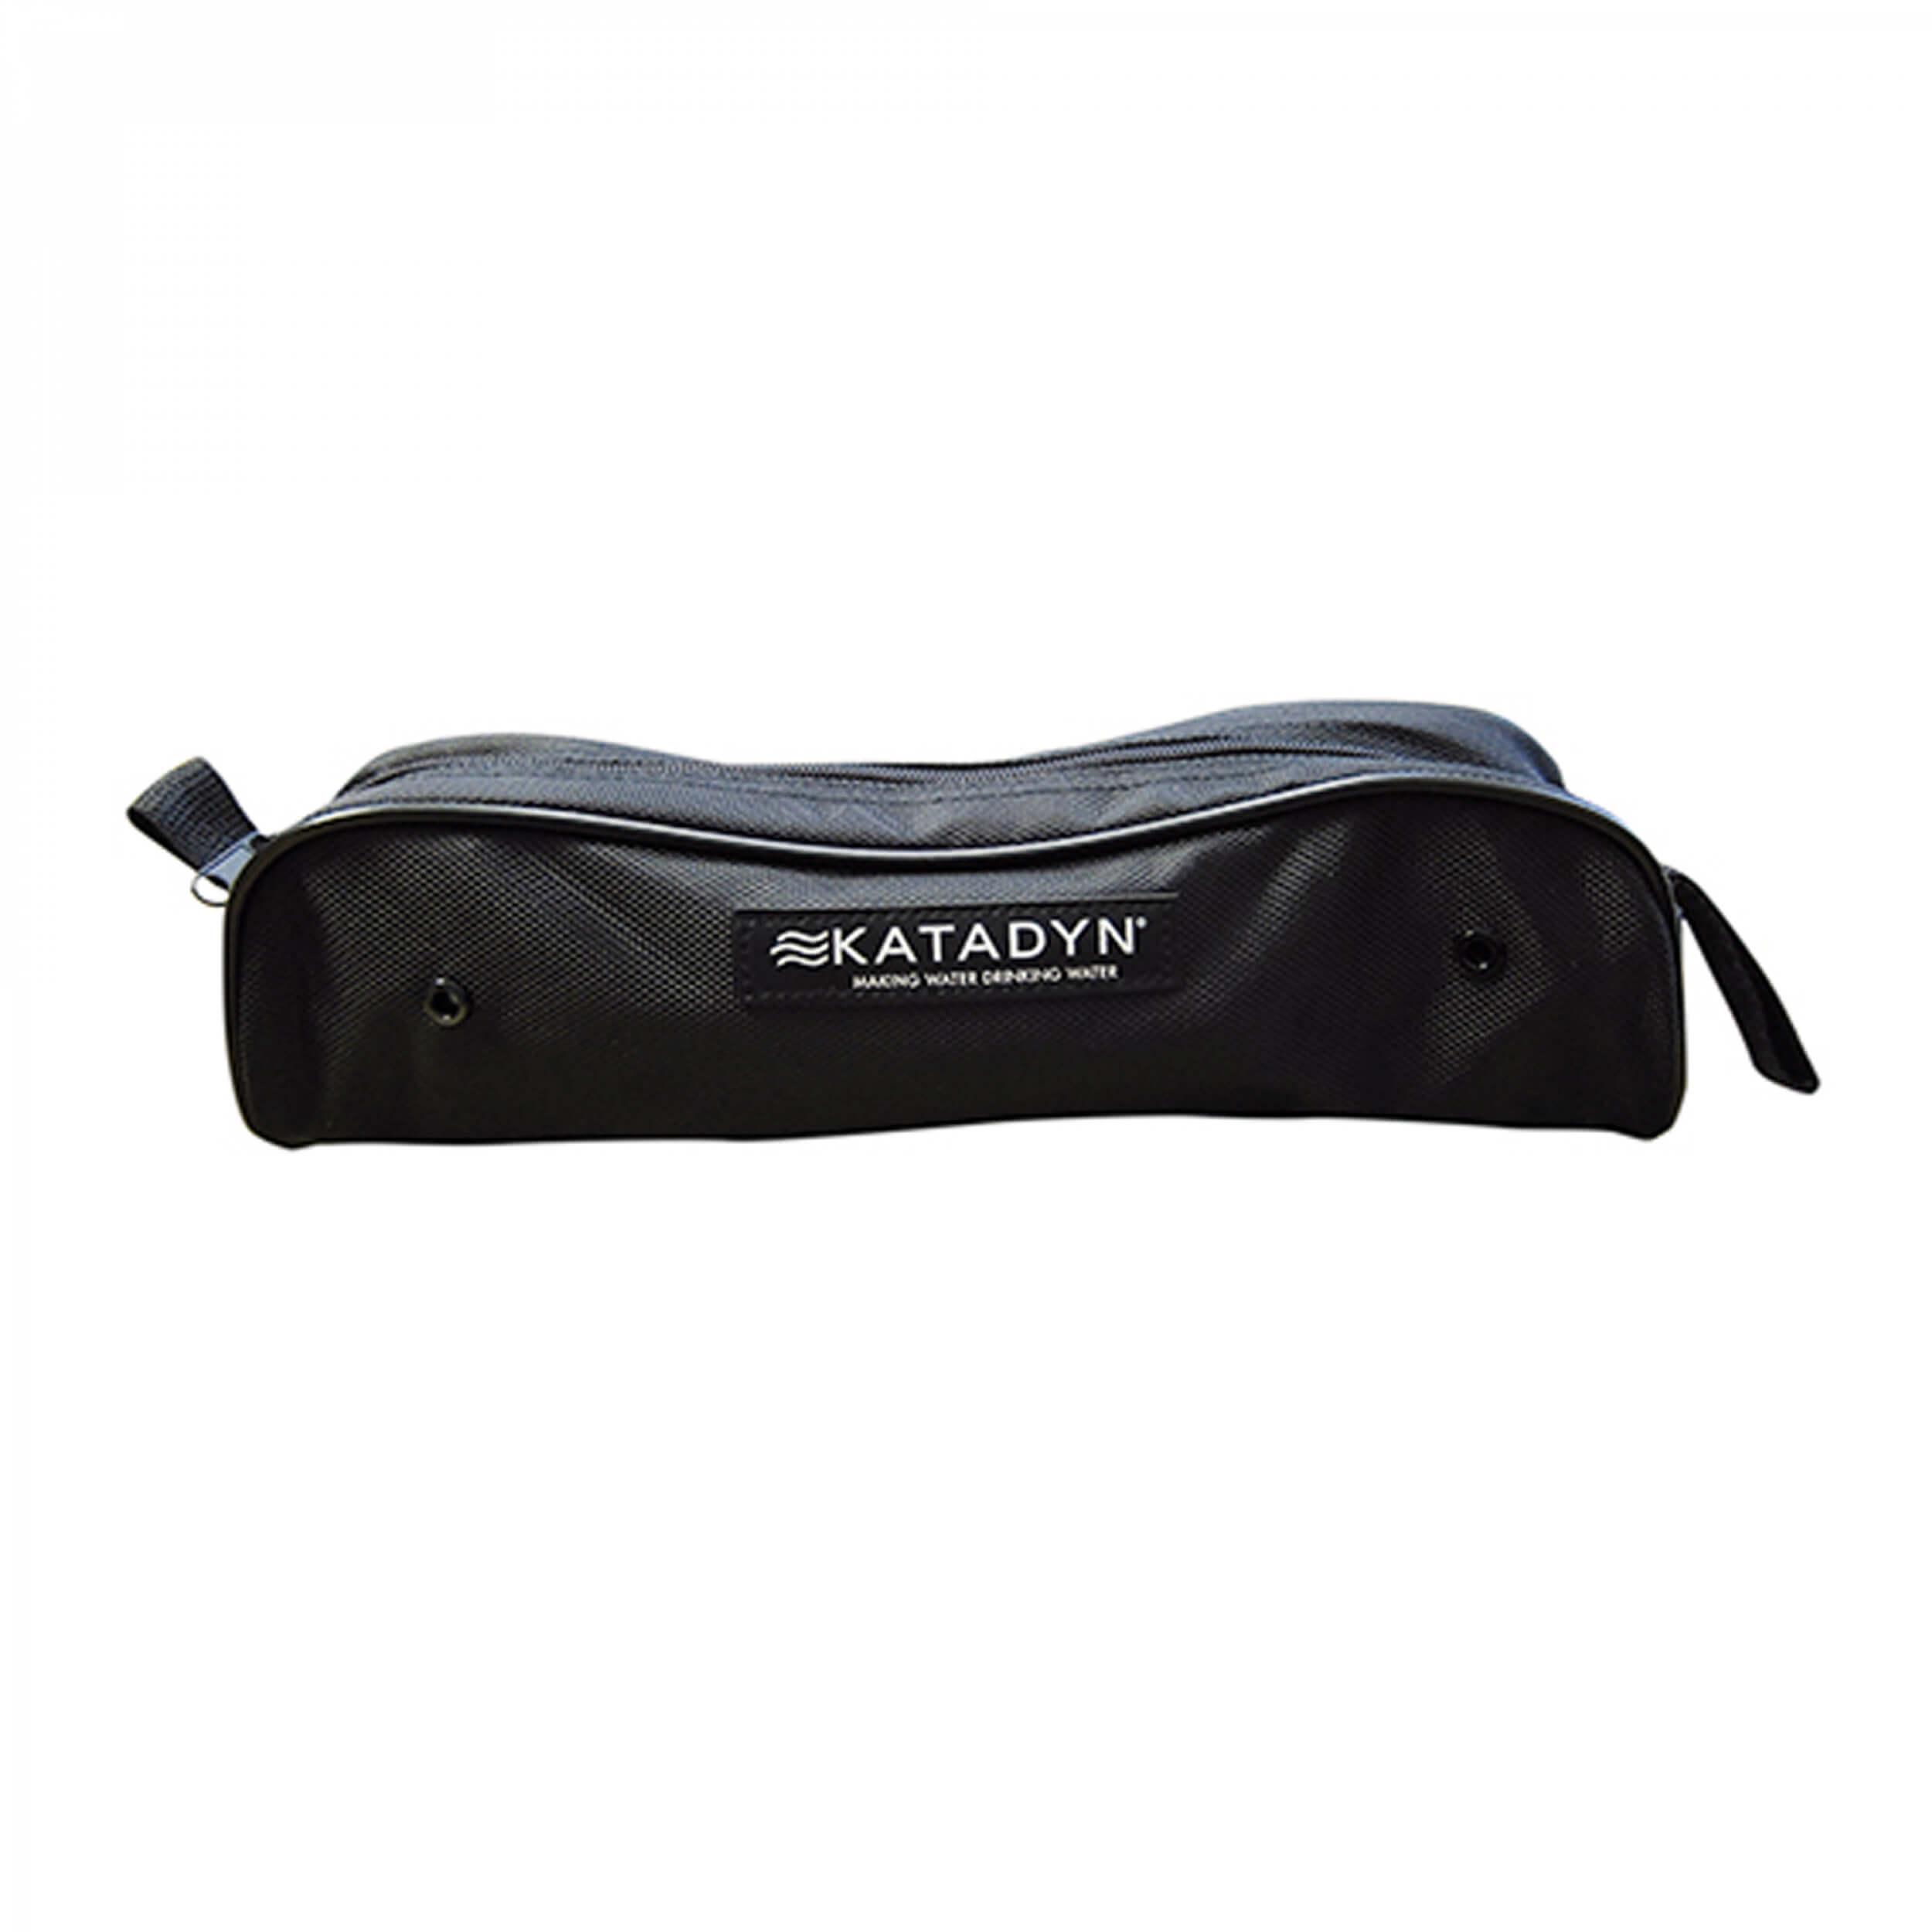 Katadyn Pocket Transporttasche